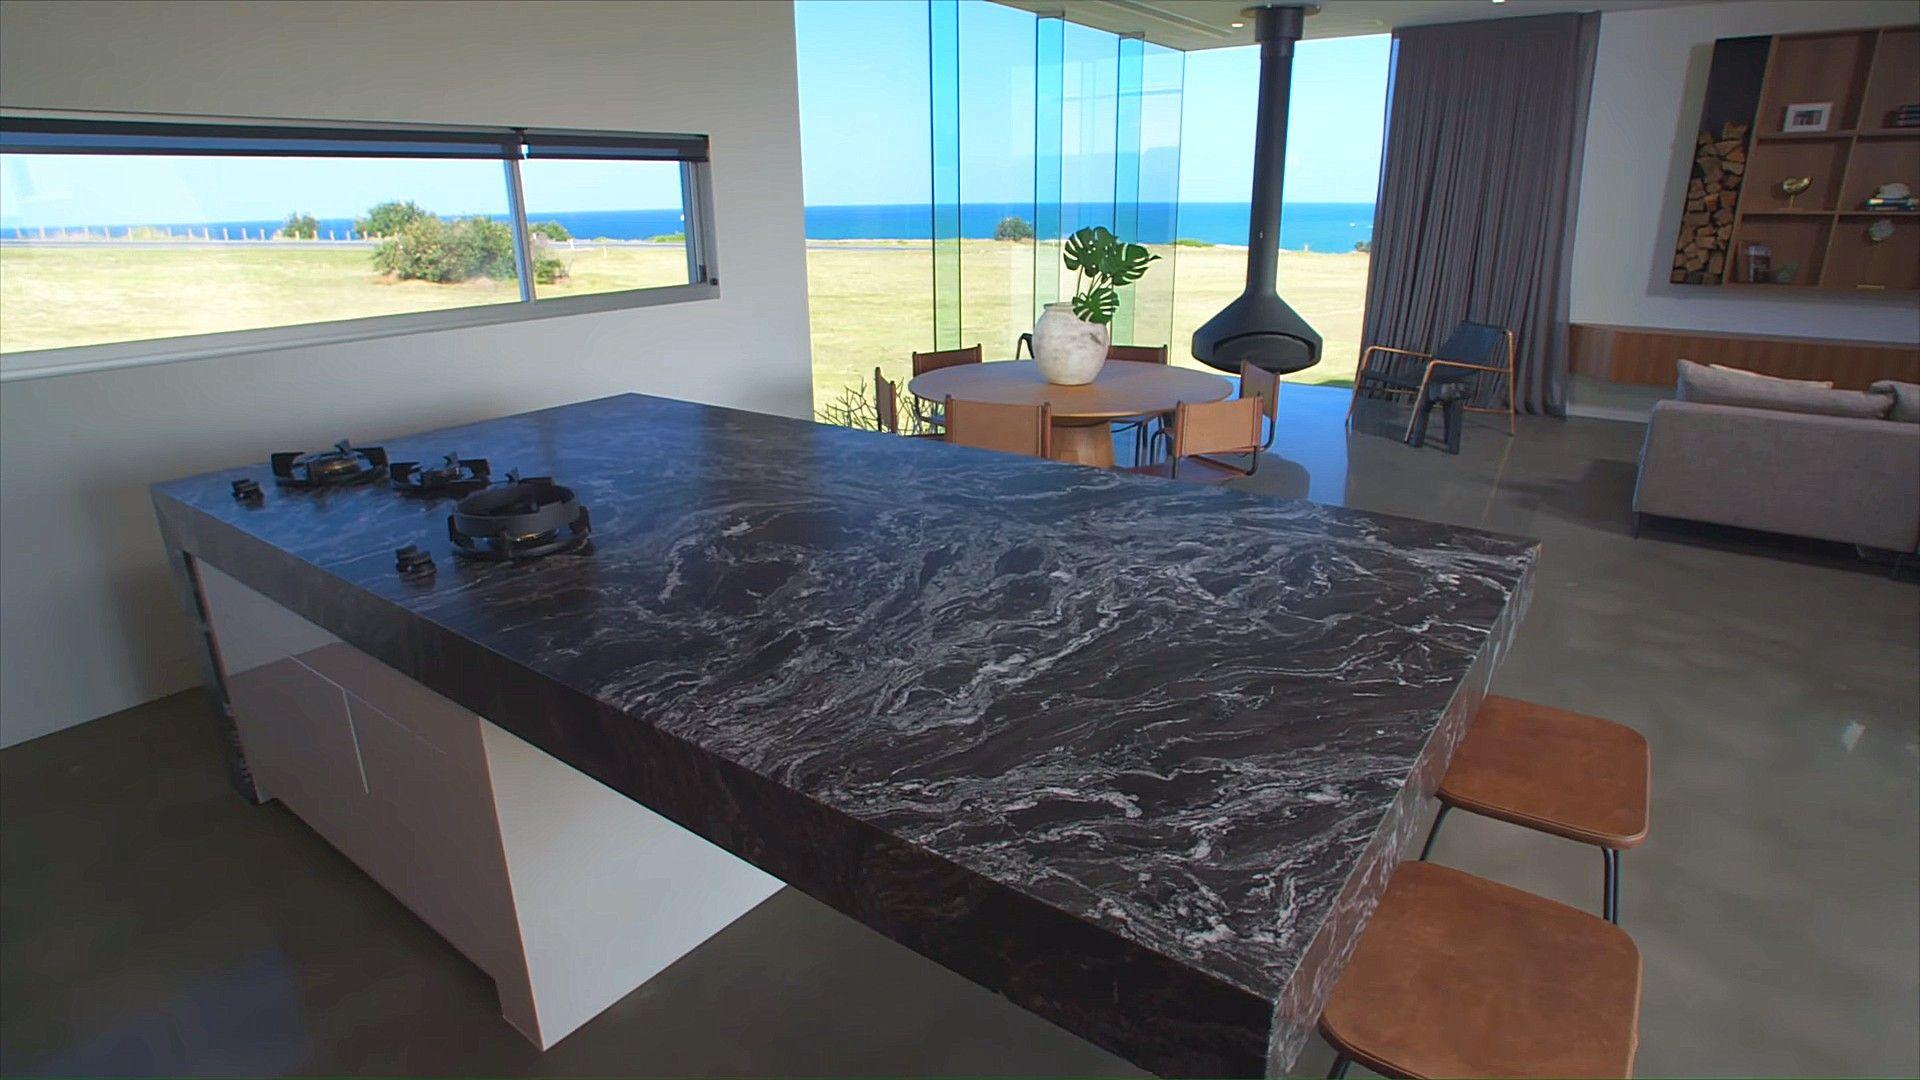 Dicker Granit Arbeitsplatte Kucheninsel Mit Angeschlossenem Herd Dengan Gambar